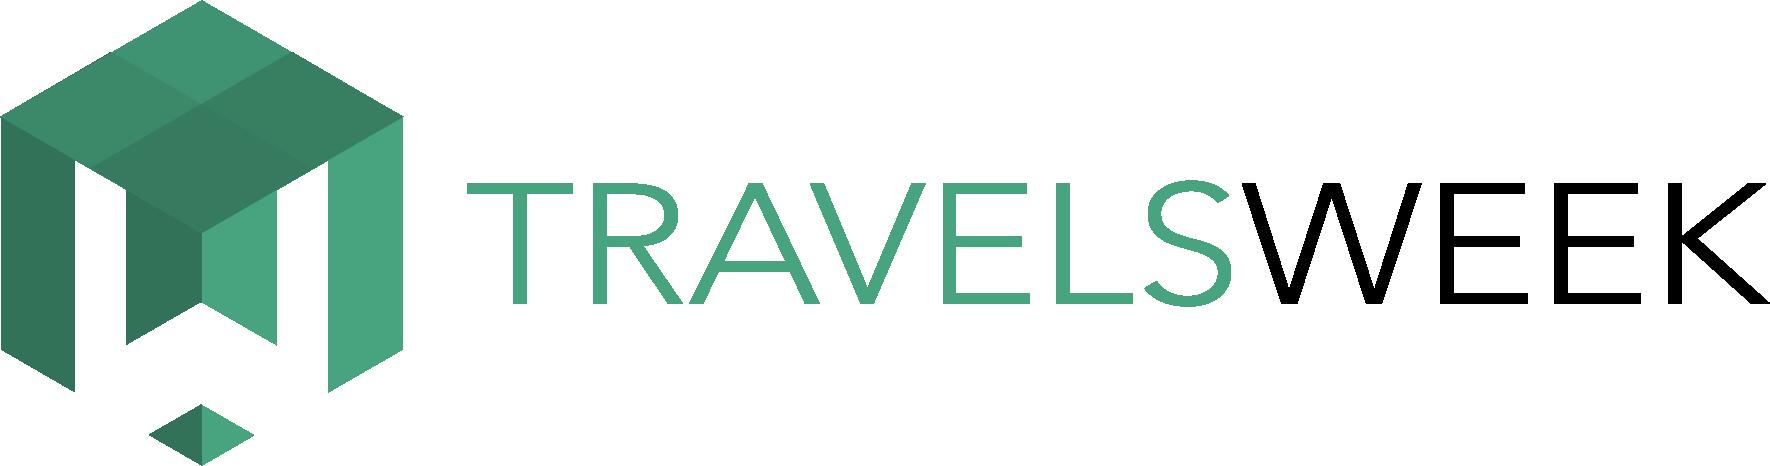 Travelsweek